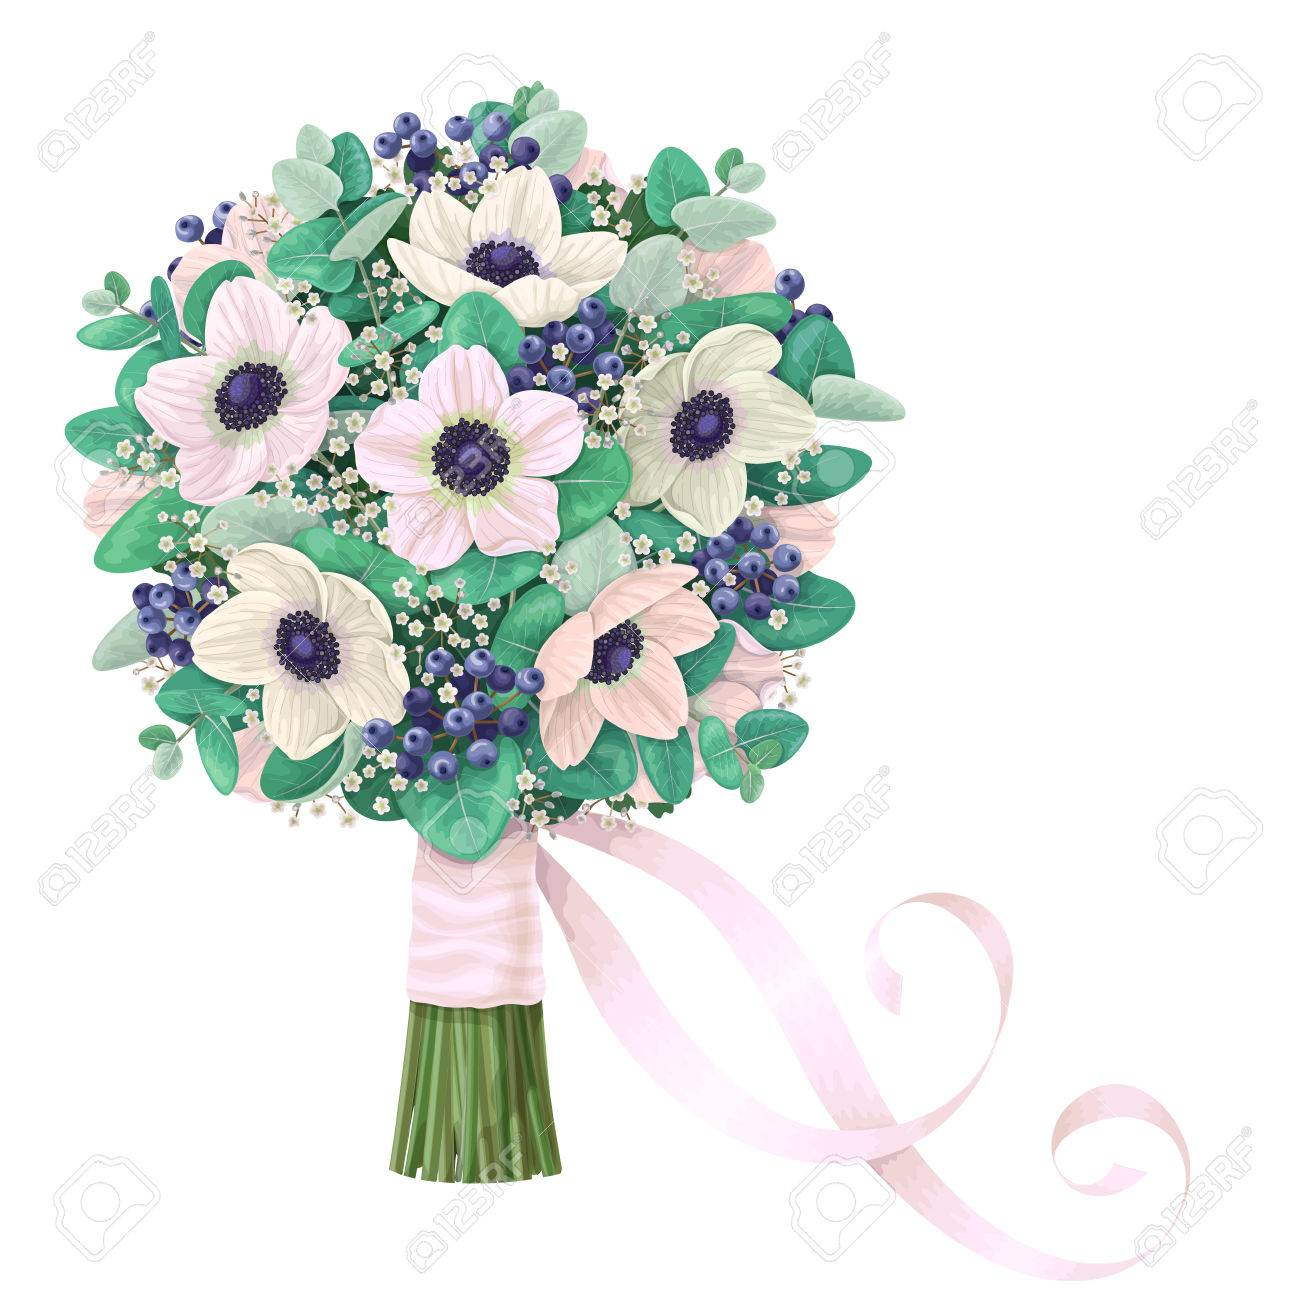 Romantic Bridal Bouquet With Anemone, Gypsophila Flowers, Eucalyptus ...